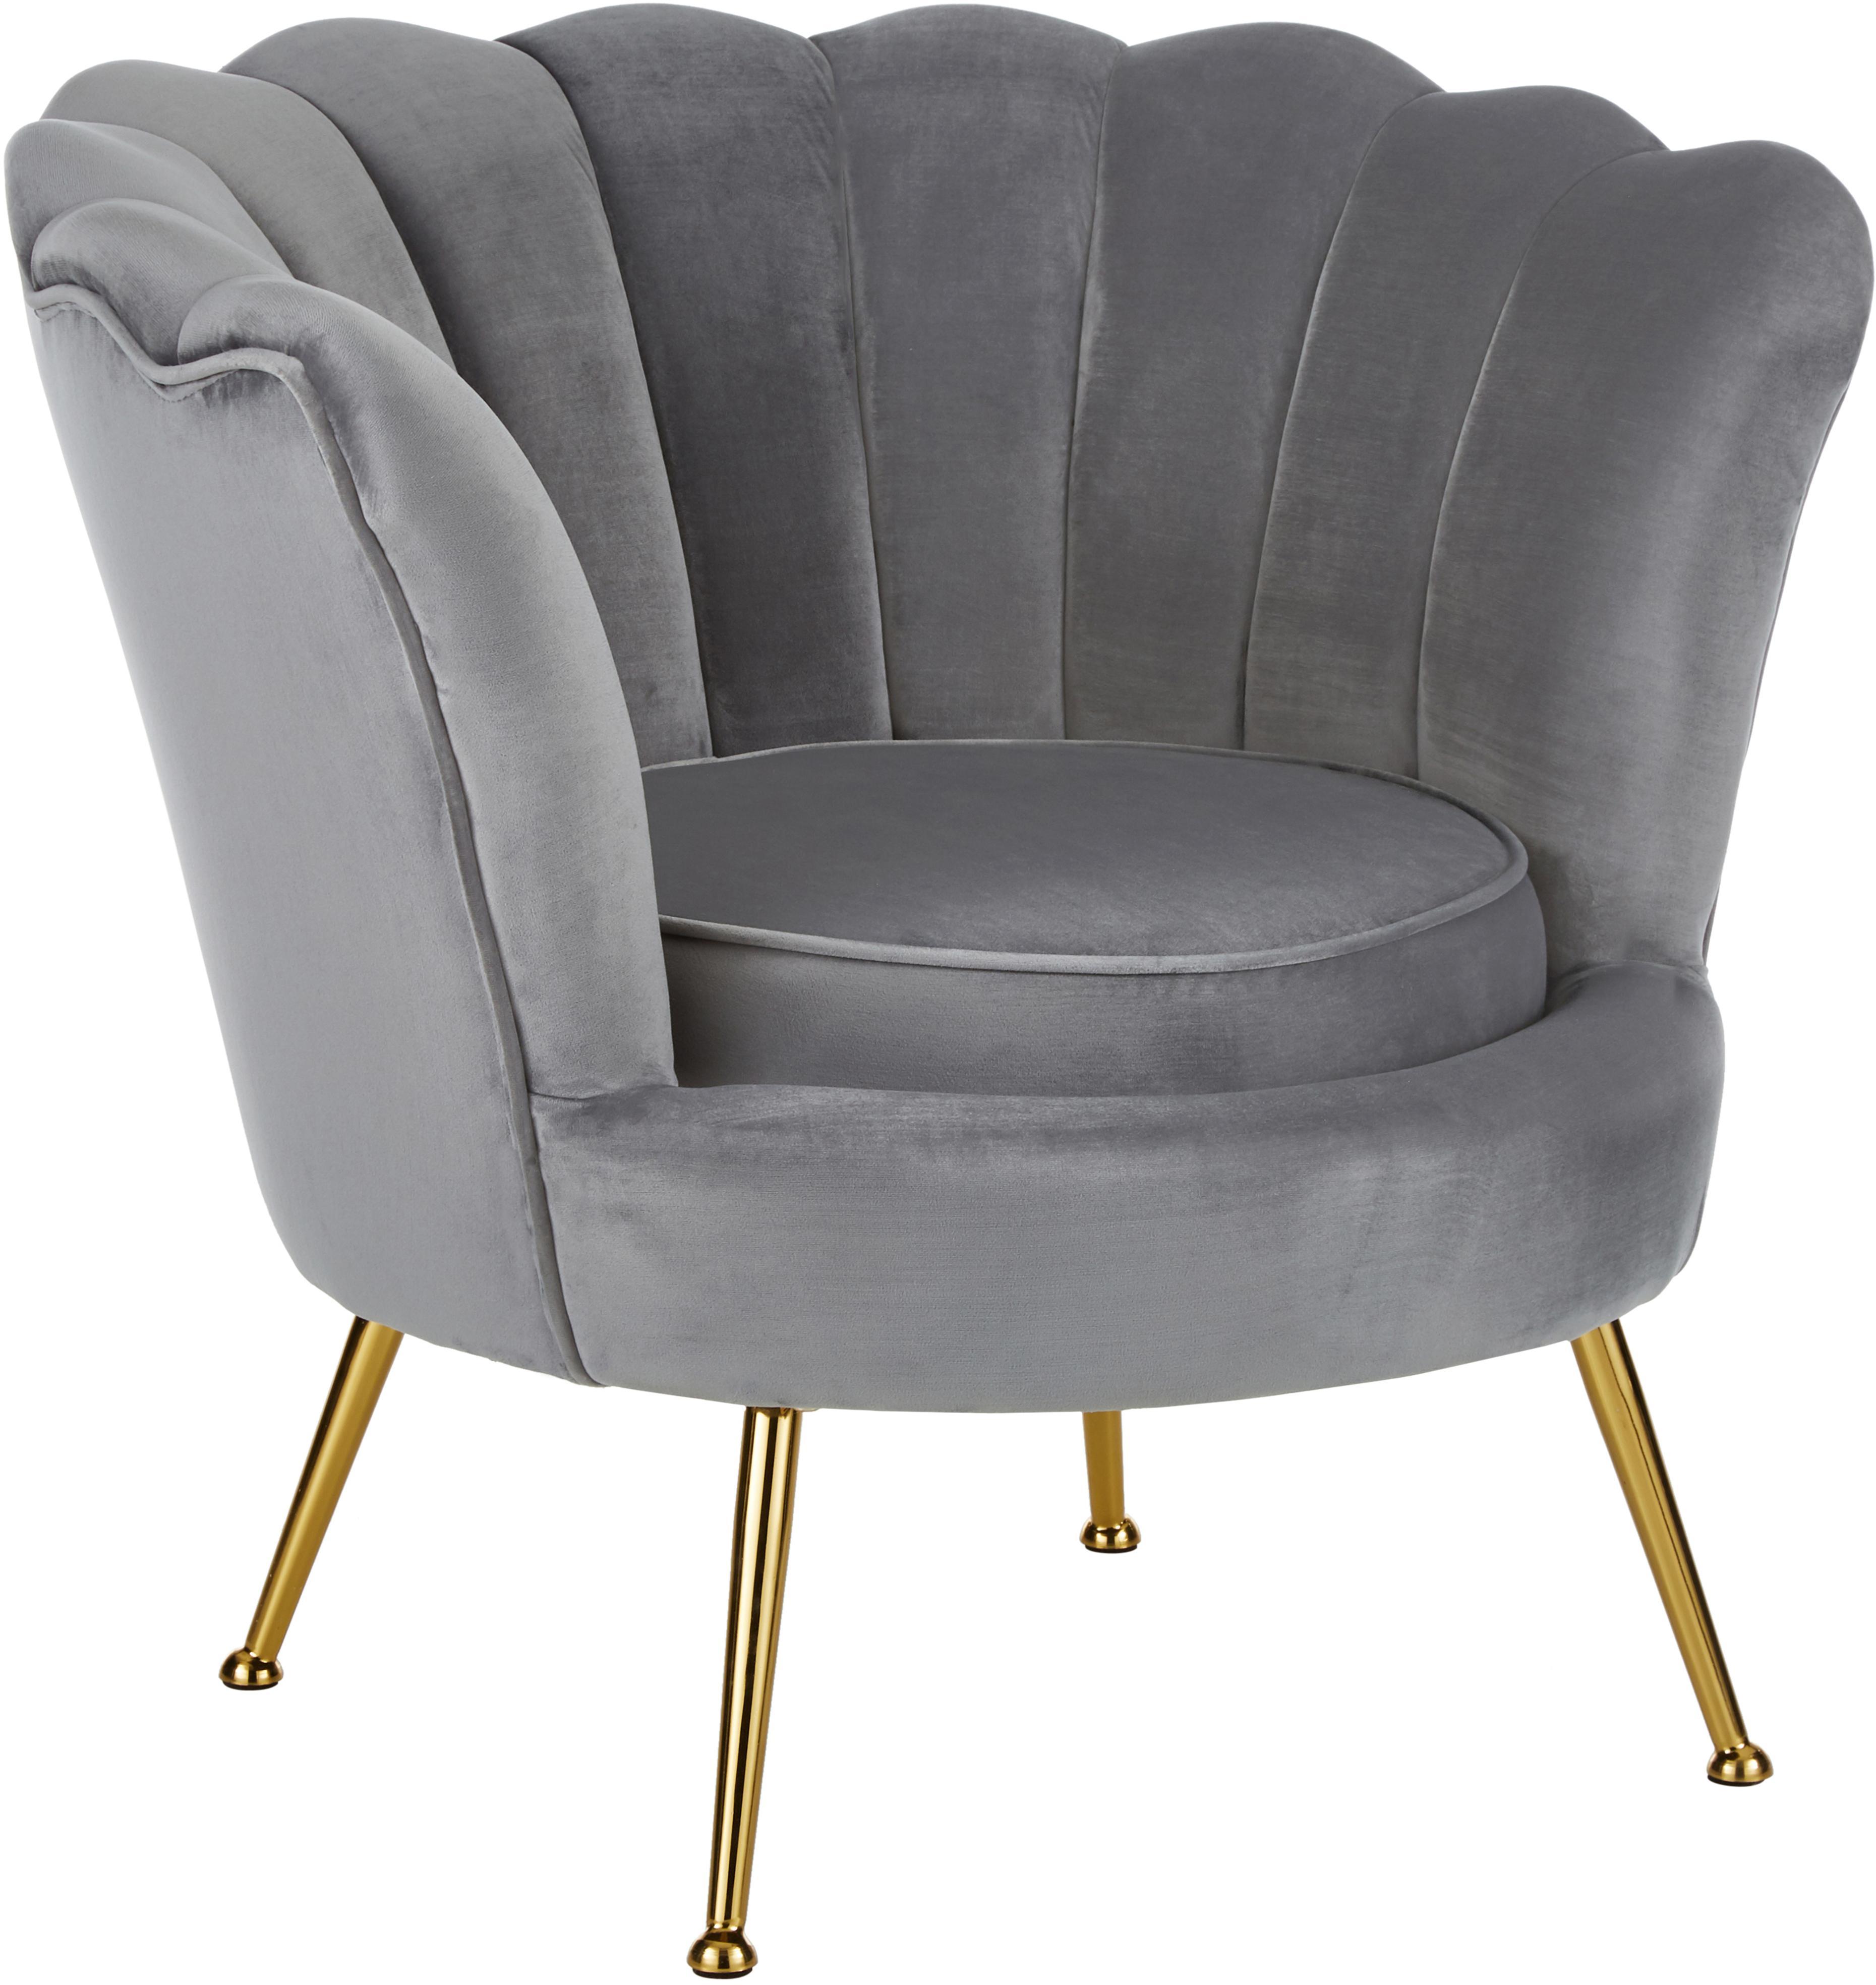 Samt-Sessel Oyster, Bezug: Samt (Polyester) 25.000 S, Gestell: Massives Pappelholz, Sper, Füße: Metall, galvanisiert, Samt Grau, B 81 x T 78 cm